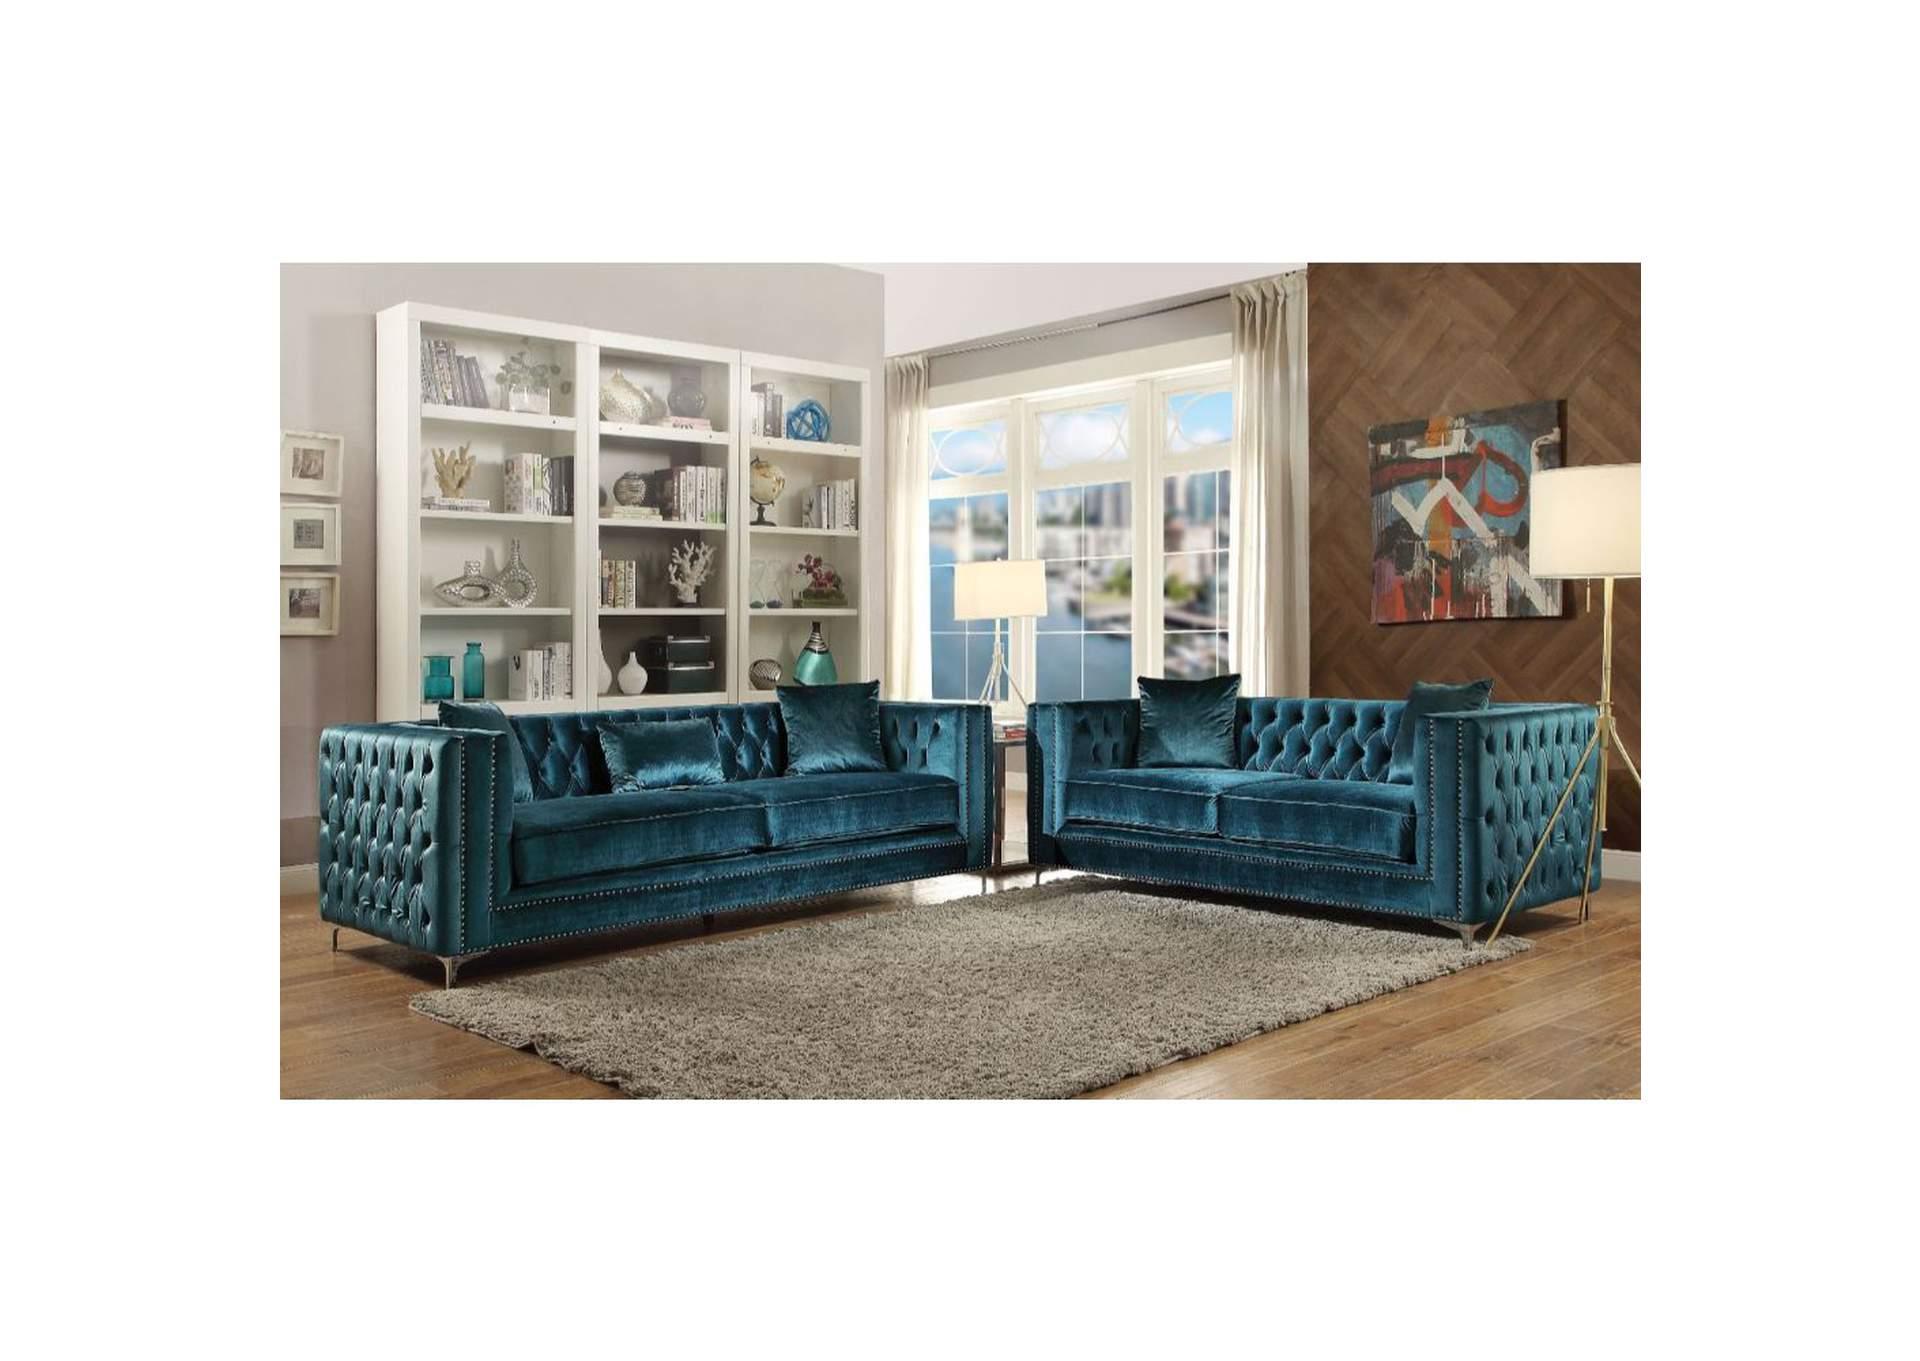 Big Box Furniture Discount Furniture Stores In Miami Florida